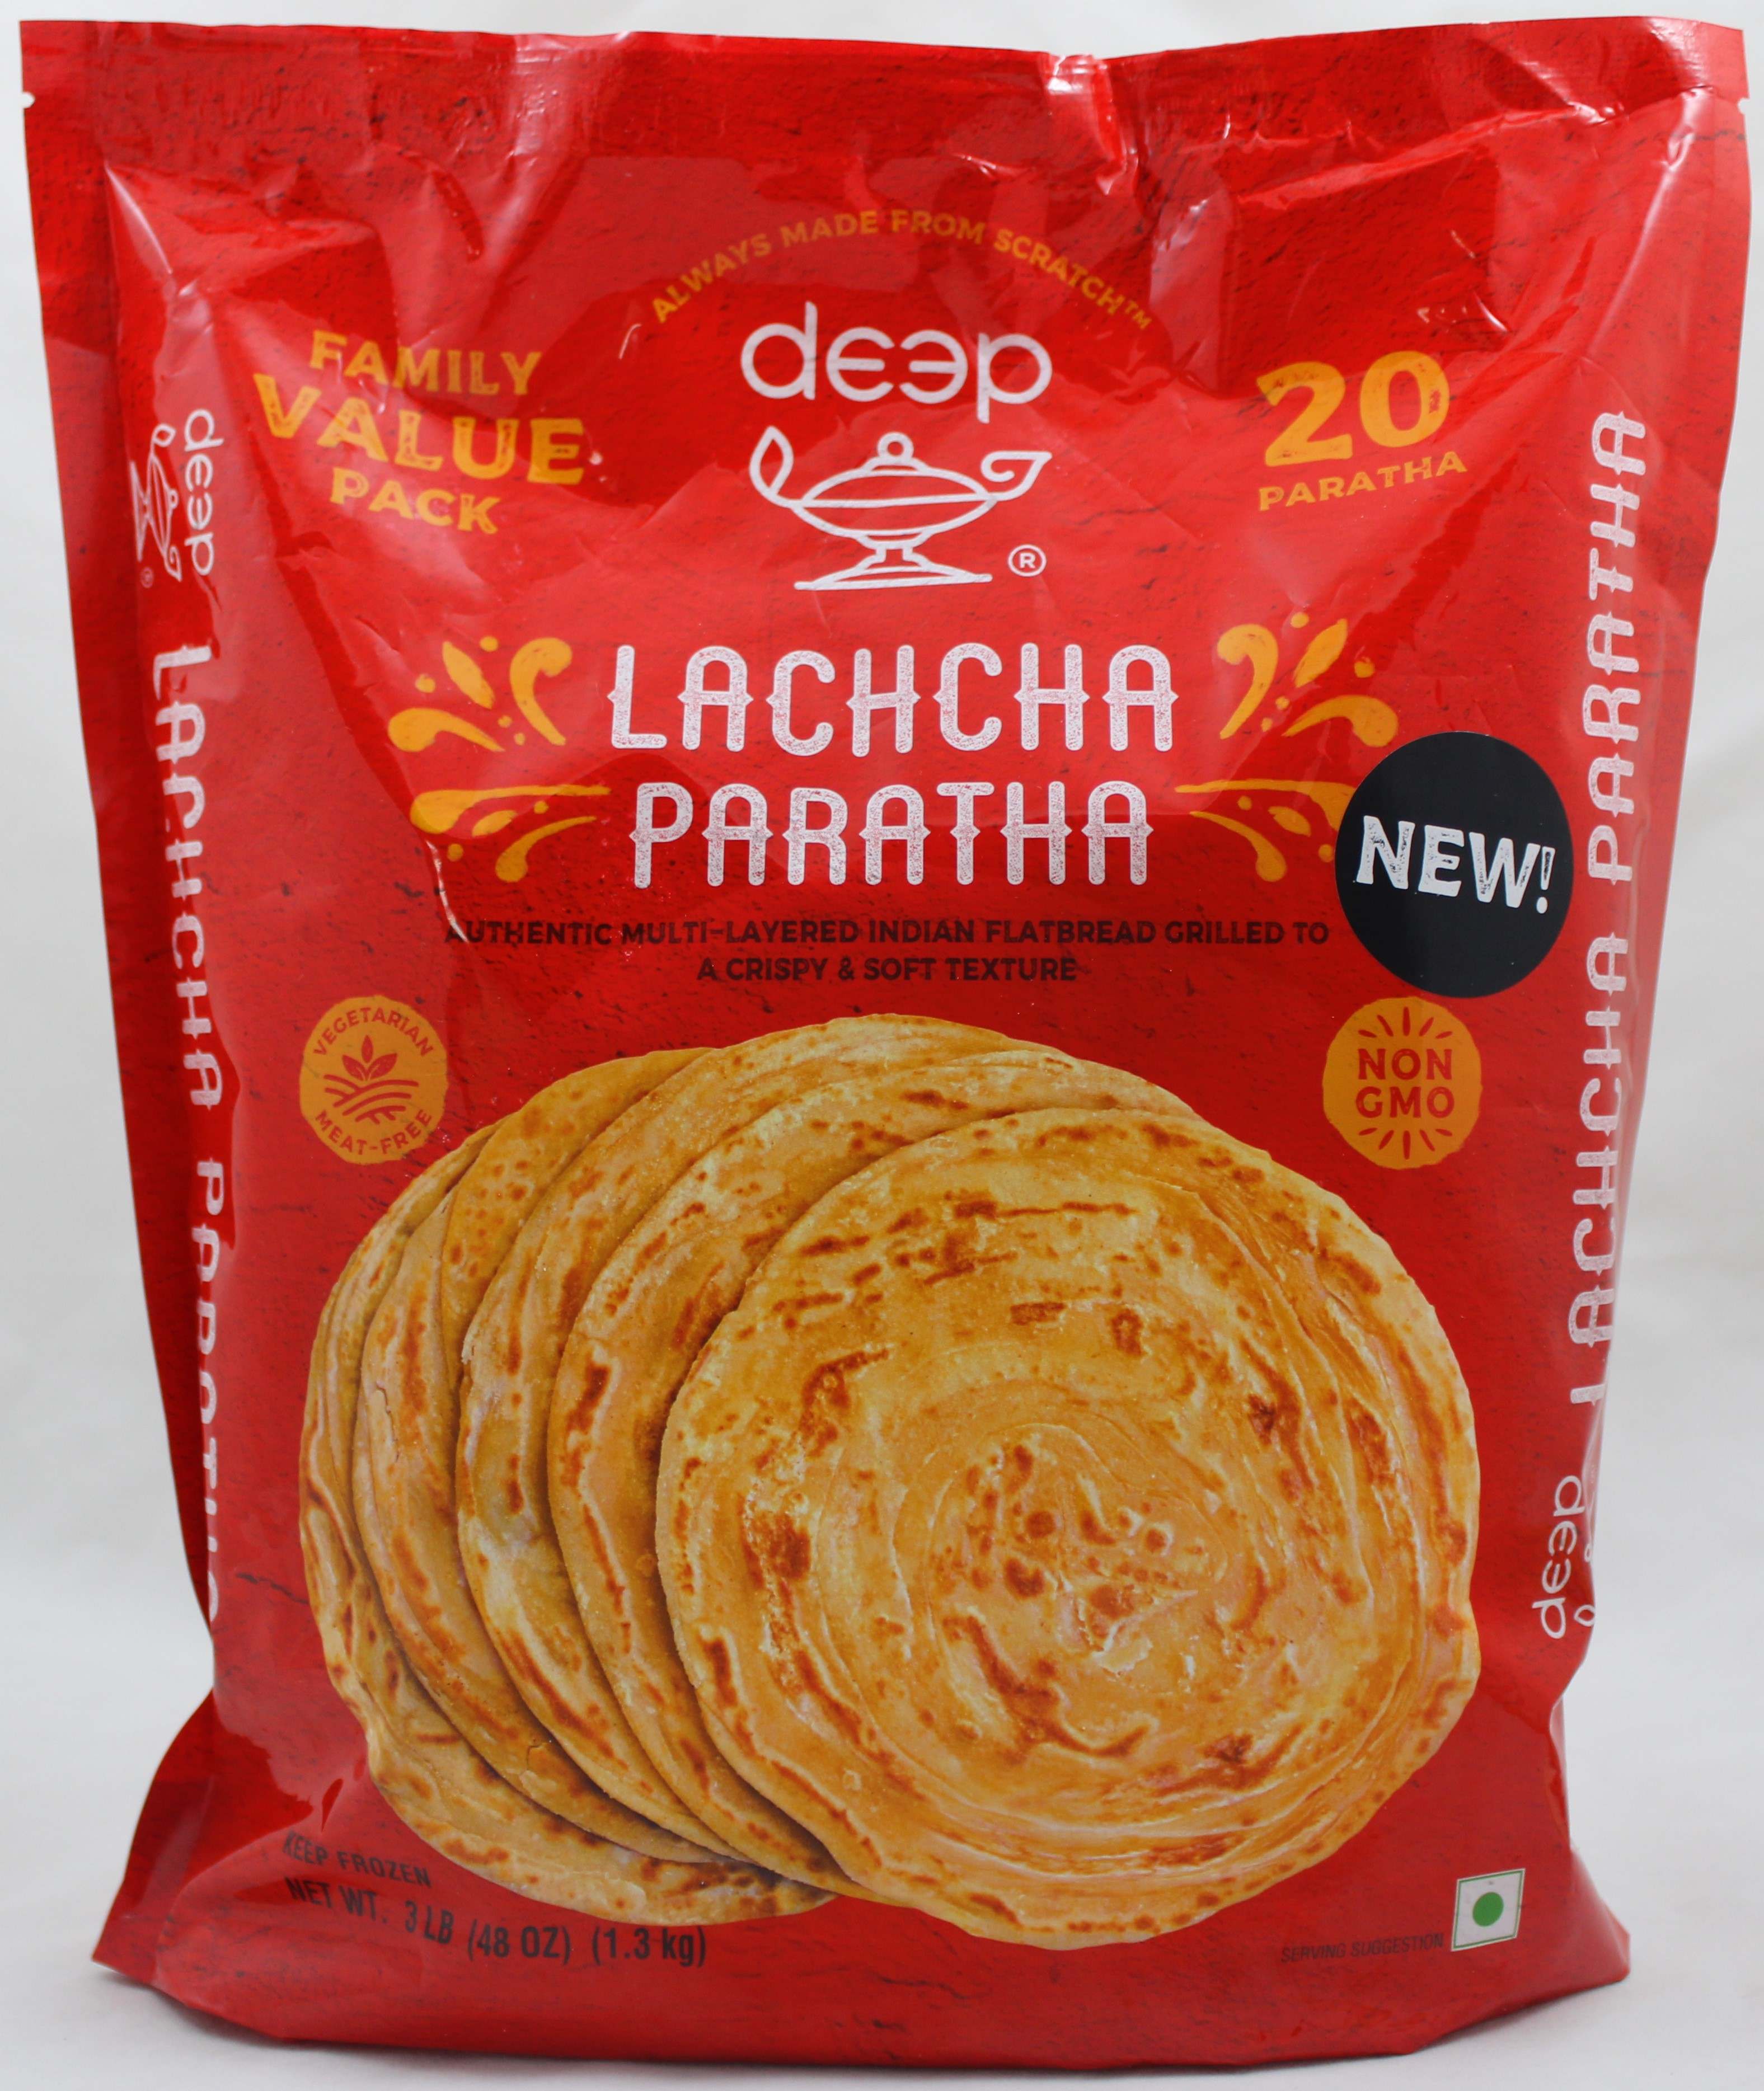 FPLachcha Paratha 48Oz (20Pcs)